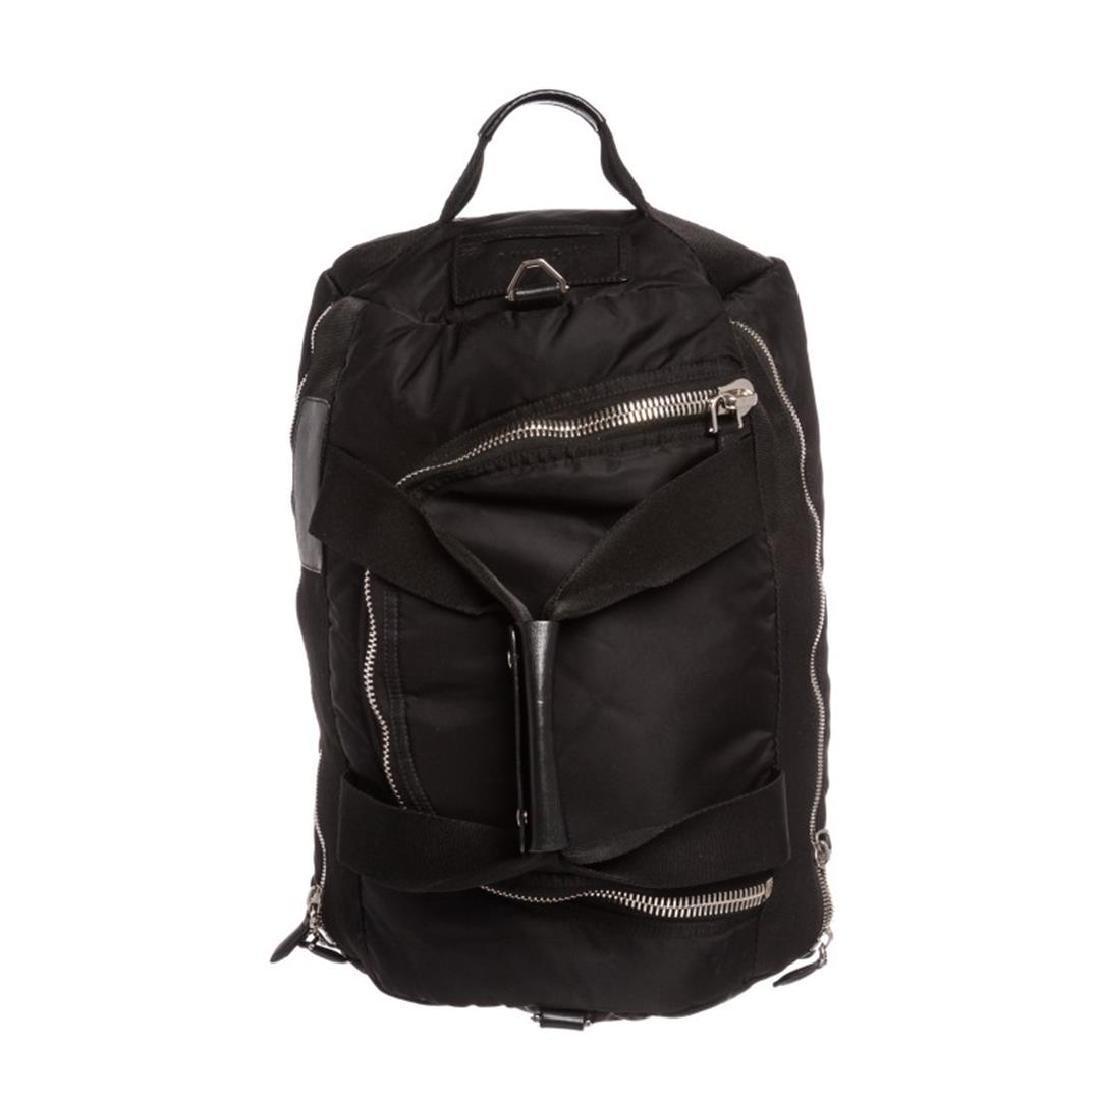 Givenchy Black Nylon Leather Trim Duffle Backpack